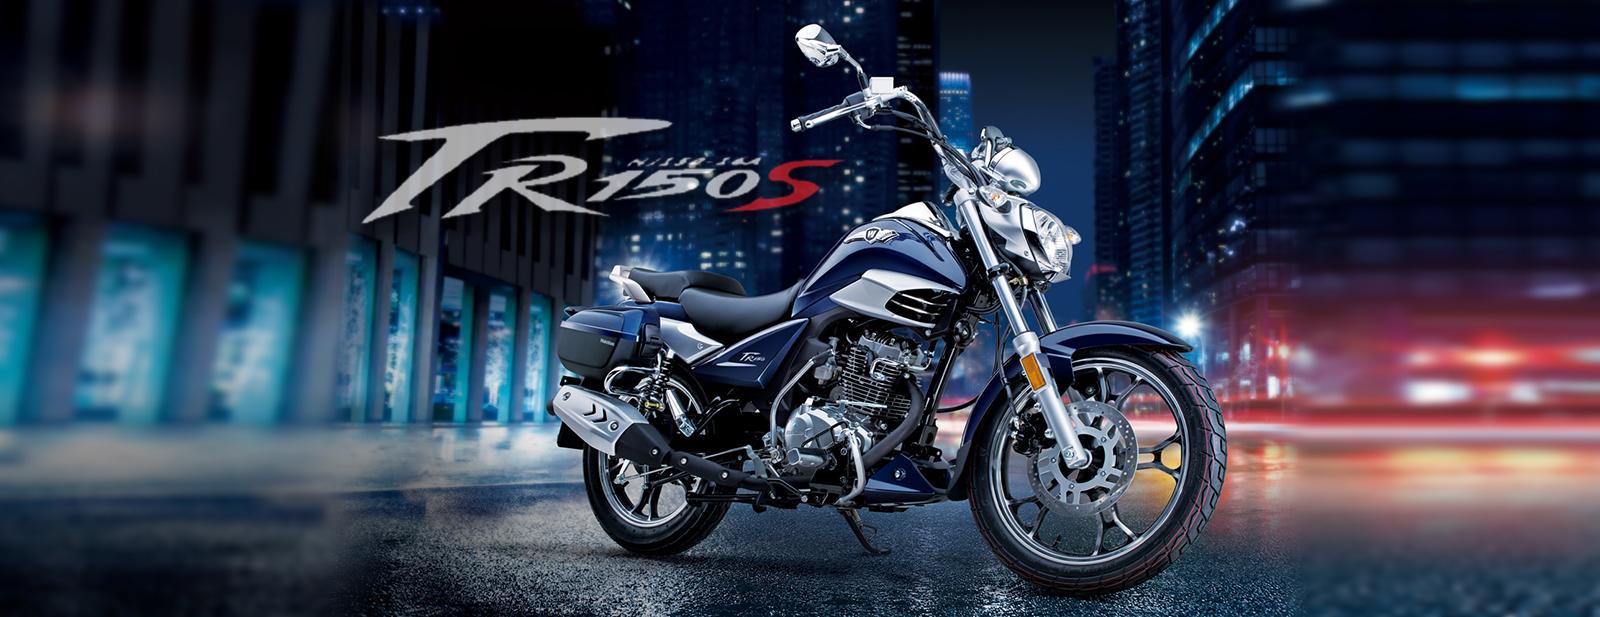 Motos-slider-TR-150-S-1600-x-617